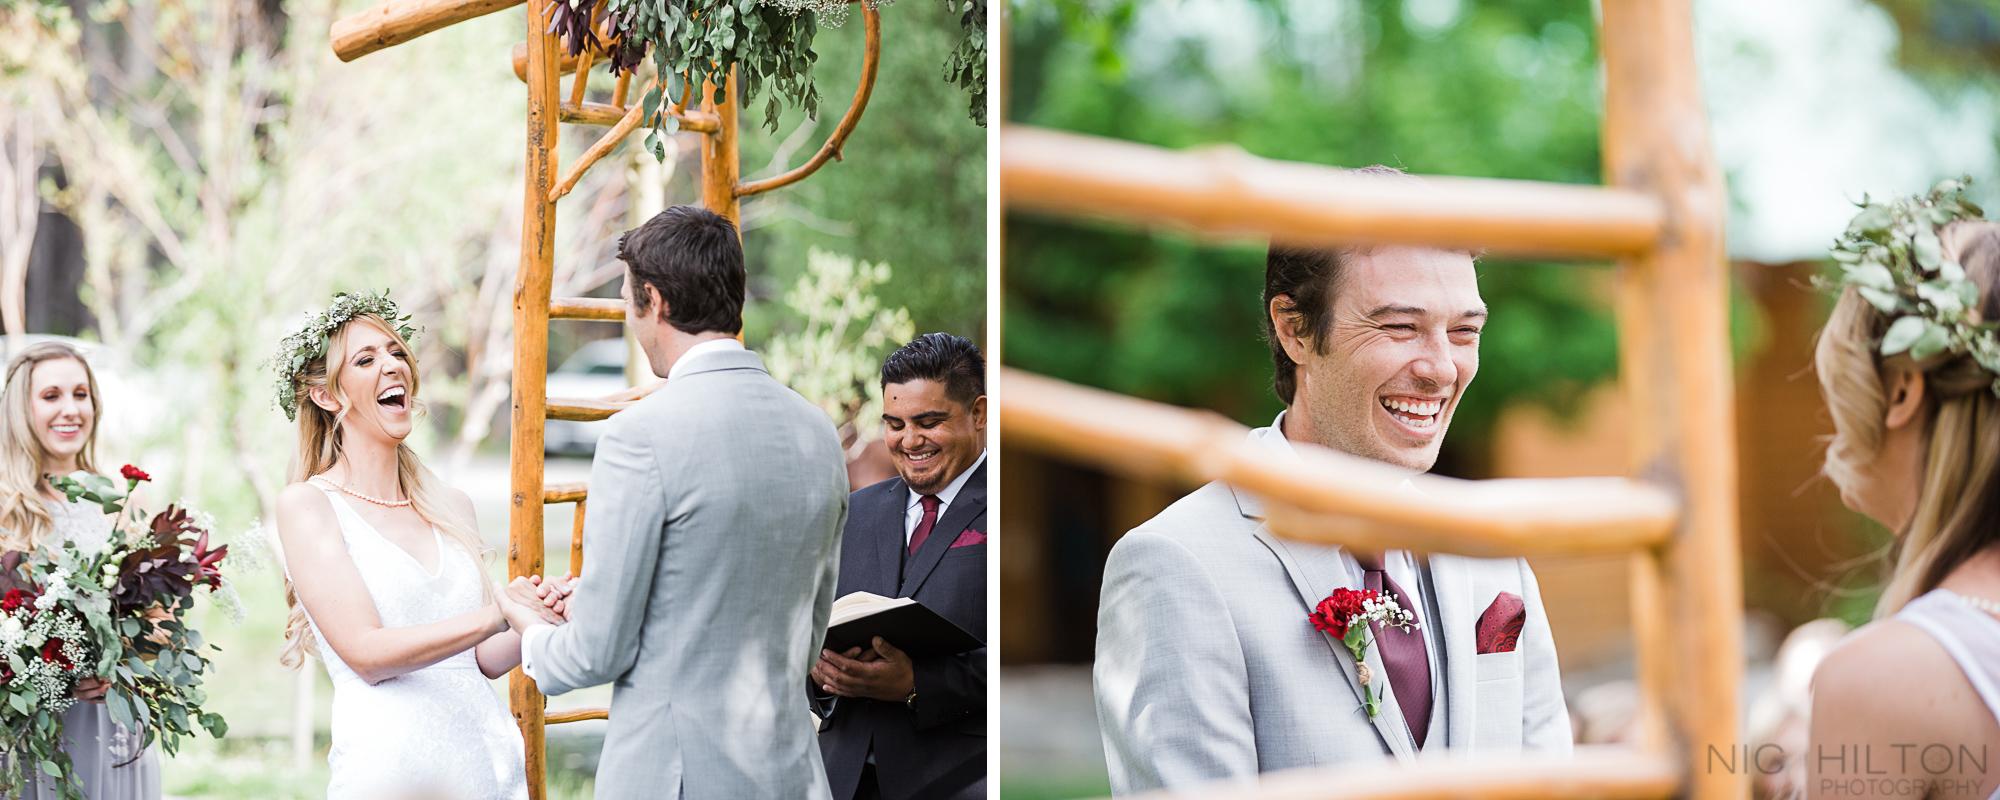 Wedding-Ceremony-at-Double-Eagle-June-Lake.jpg